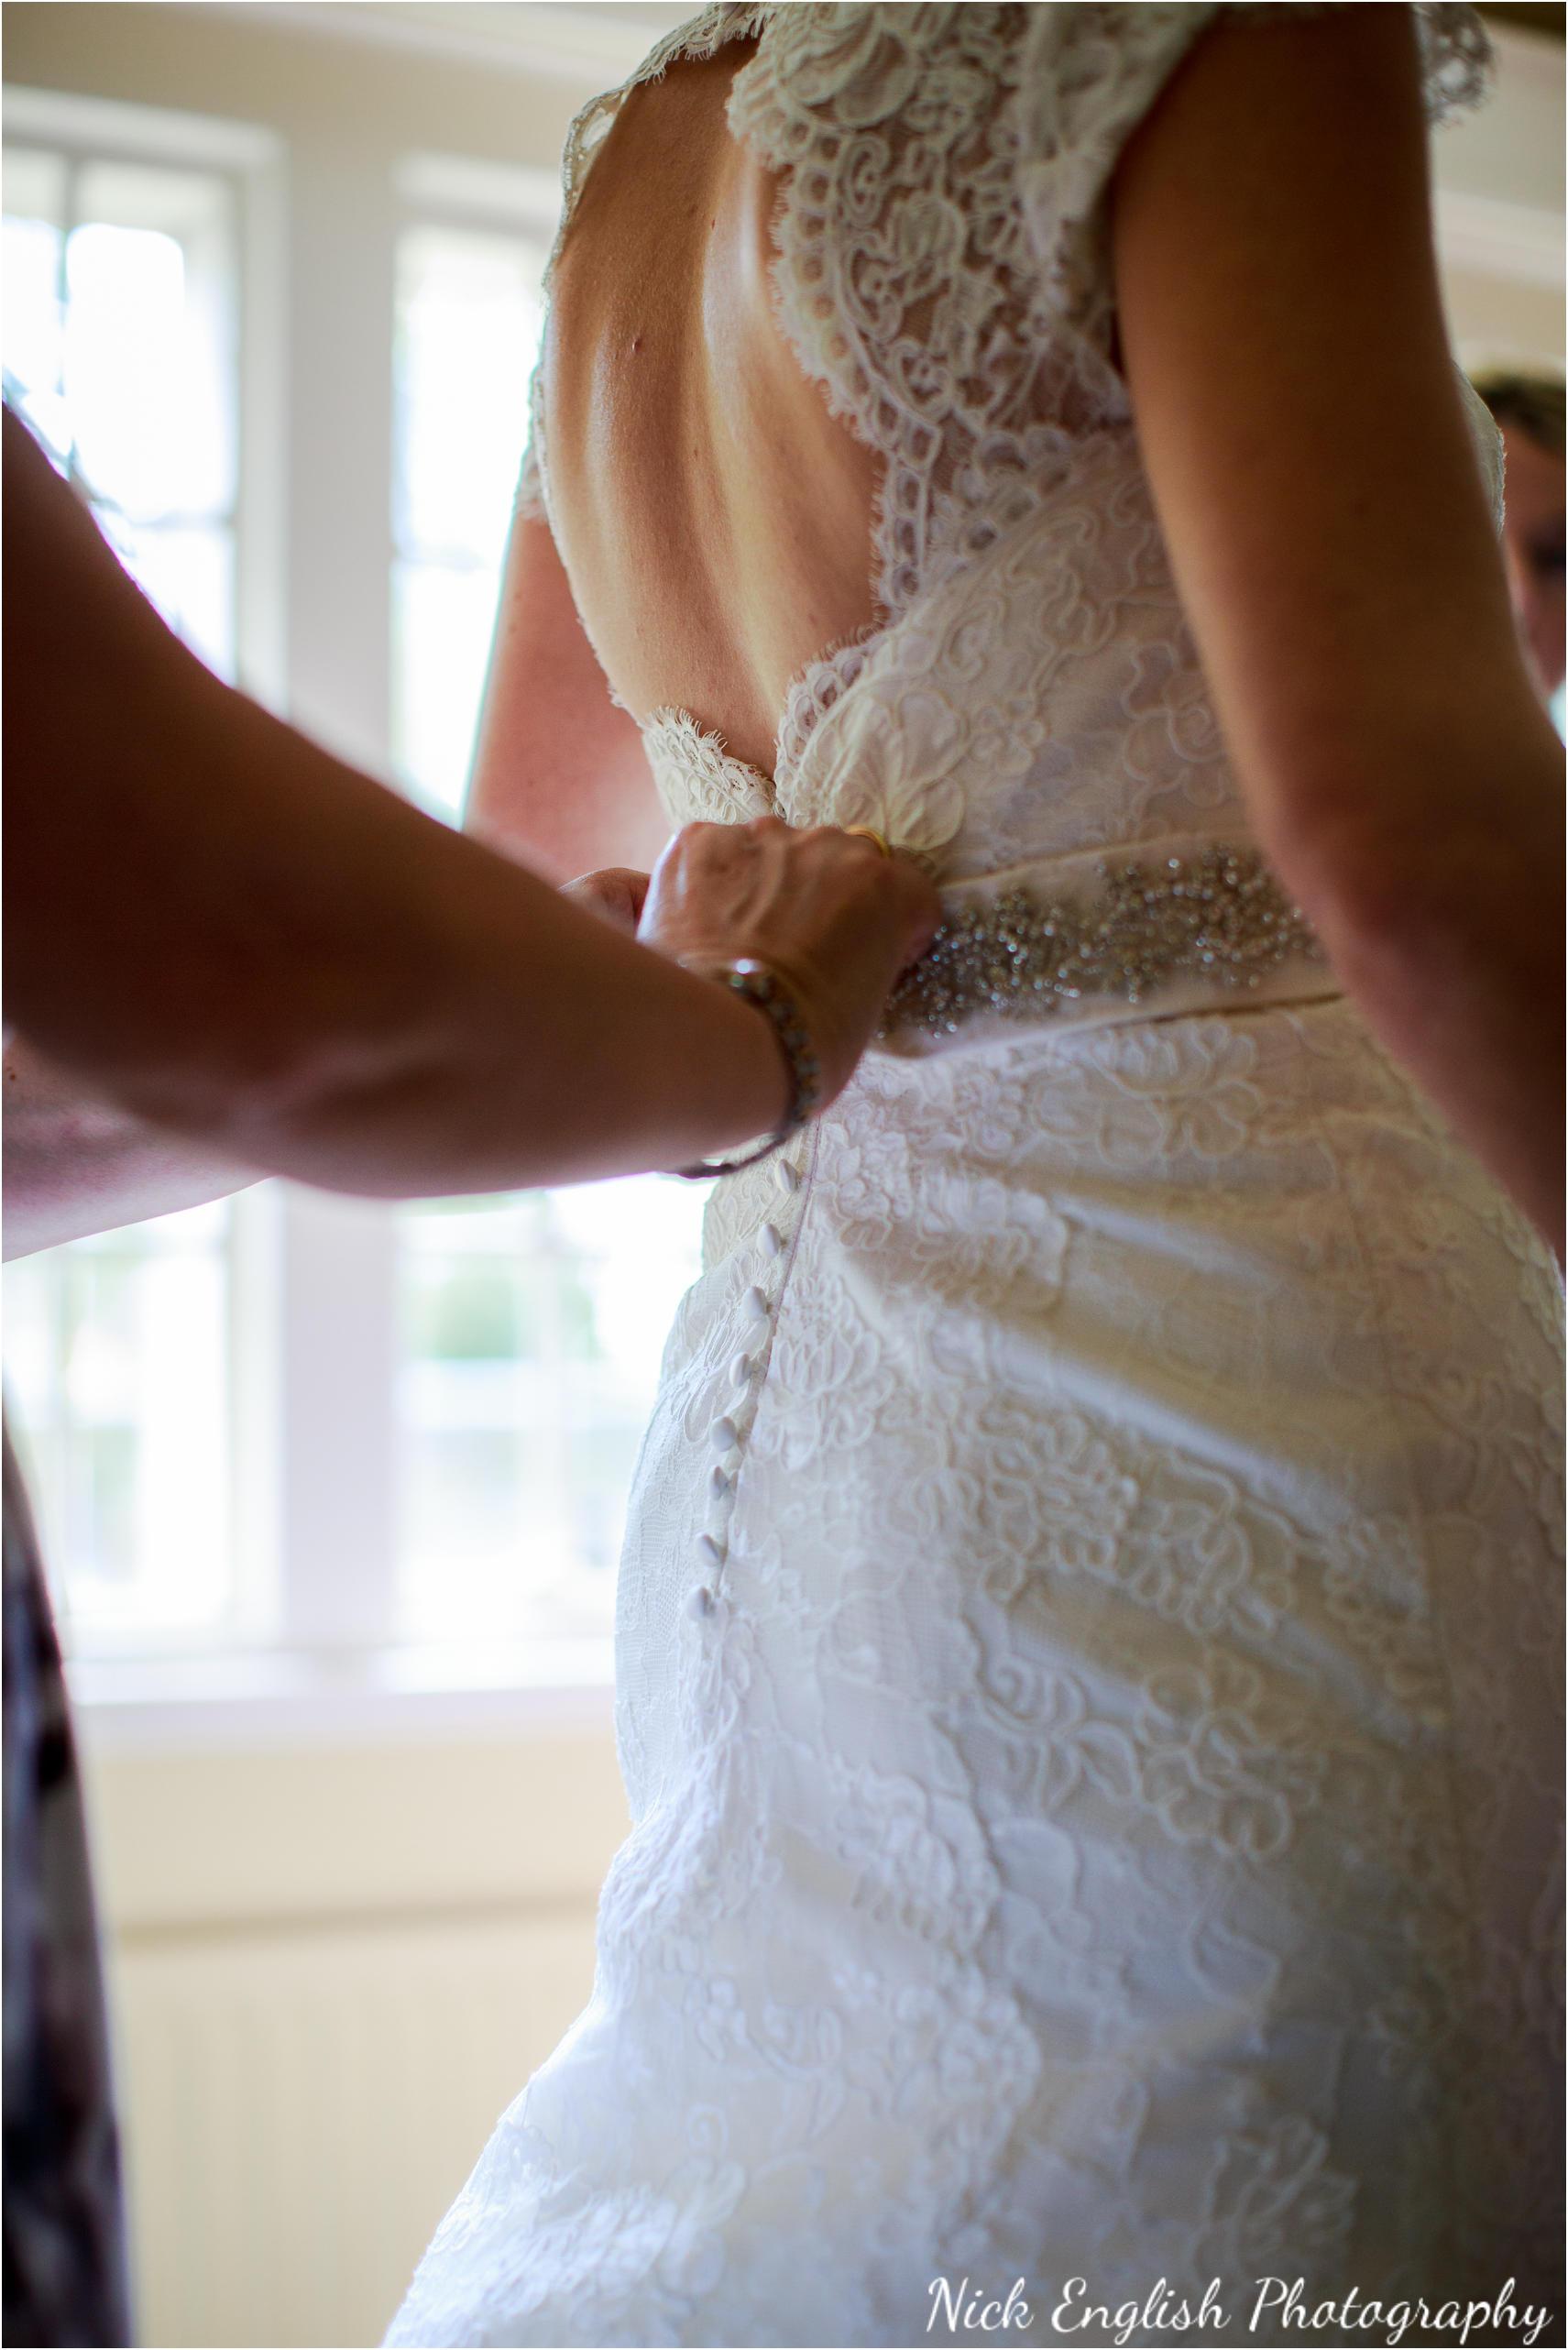 Alison James Wedding Photographs at Eaves Hall West Bradford 59jpg.jpeg